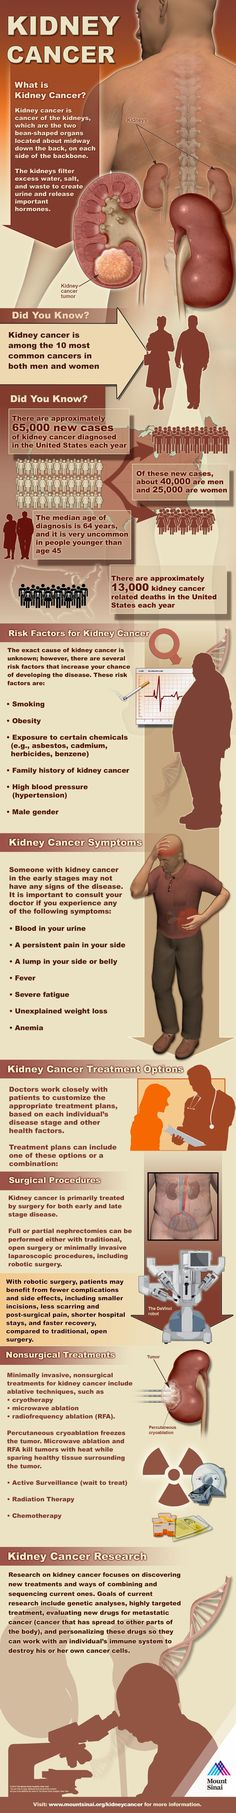 Kidney Cancer #KidneyCancer #Health #Cancer #infographic